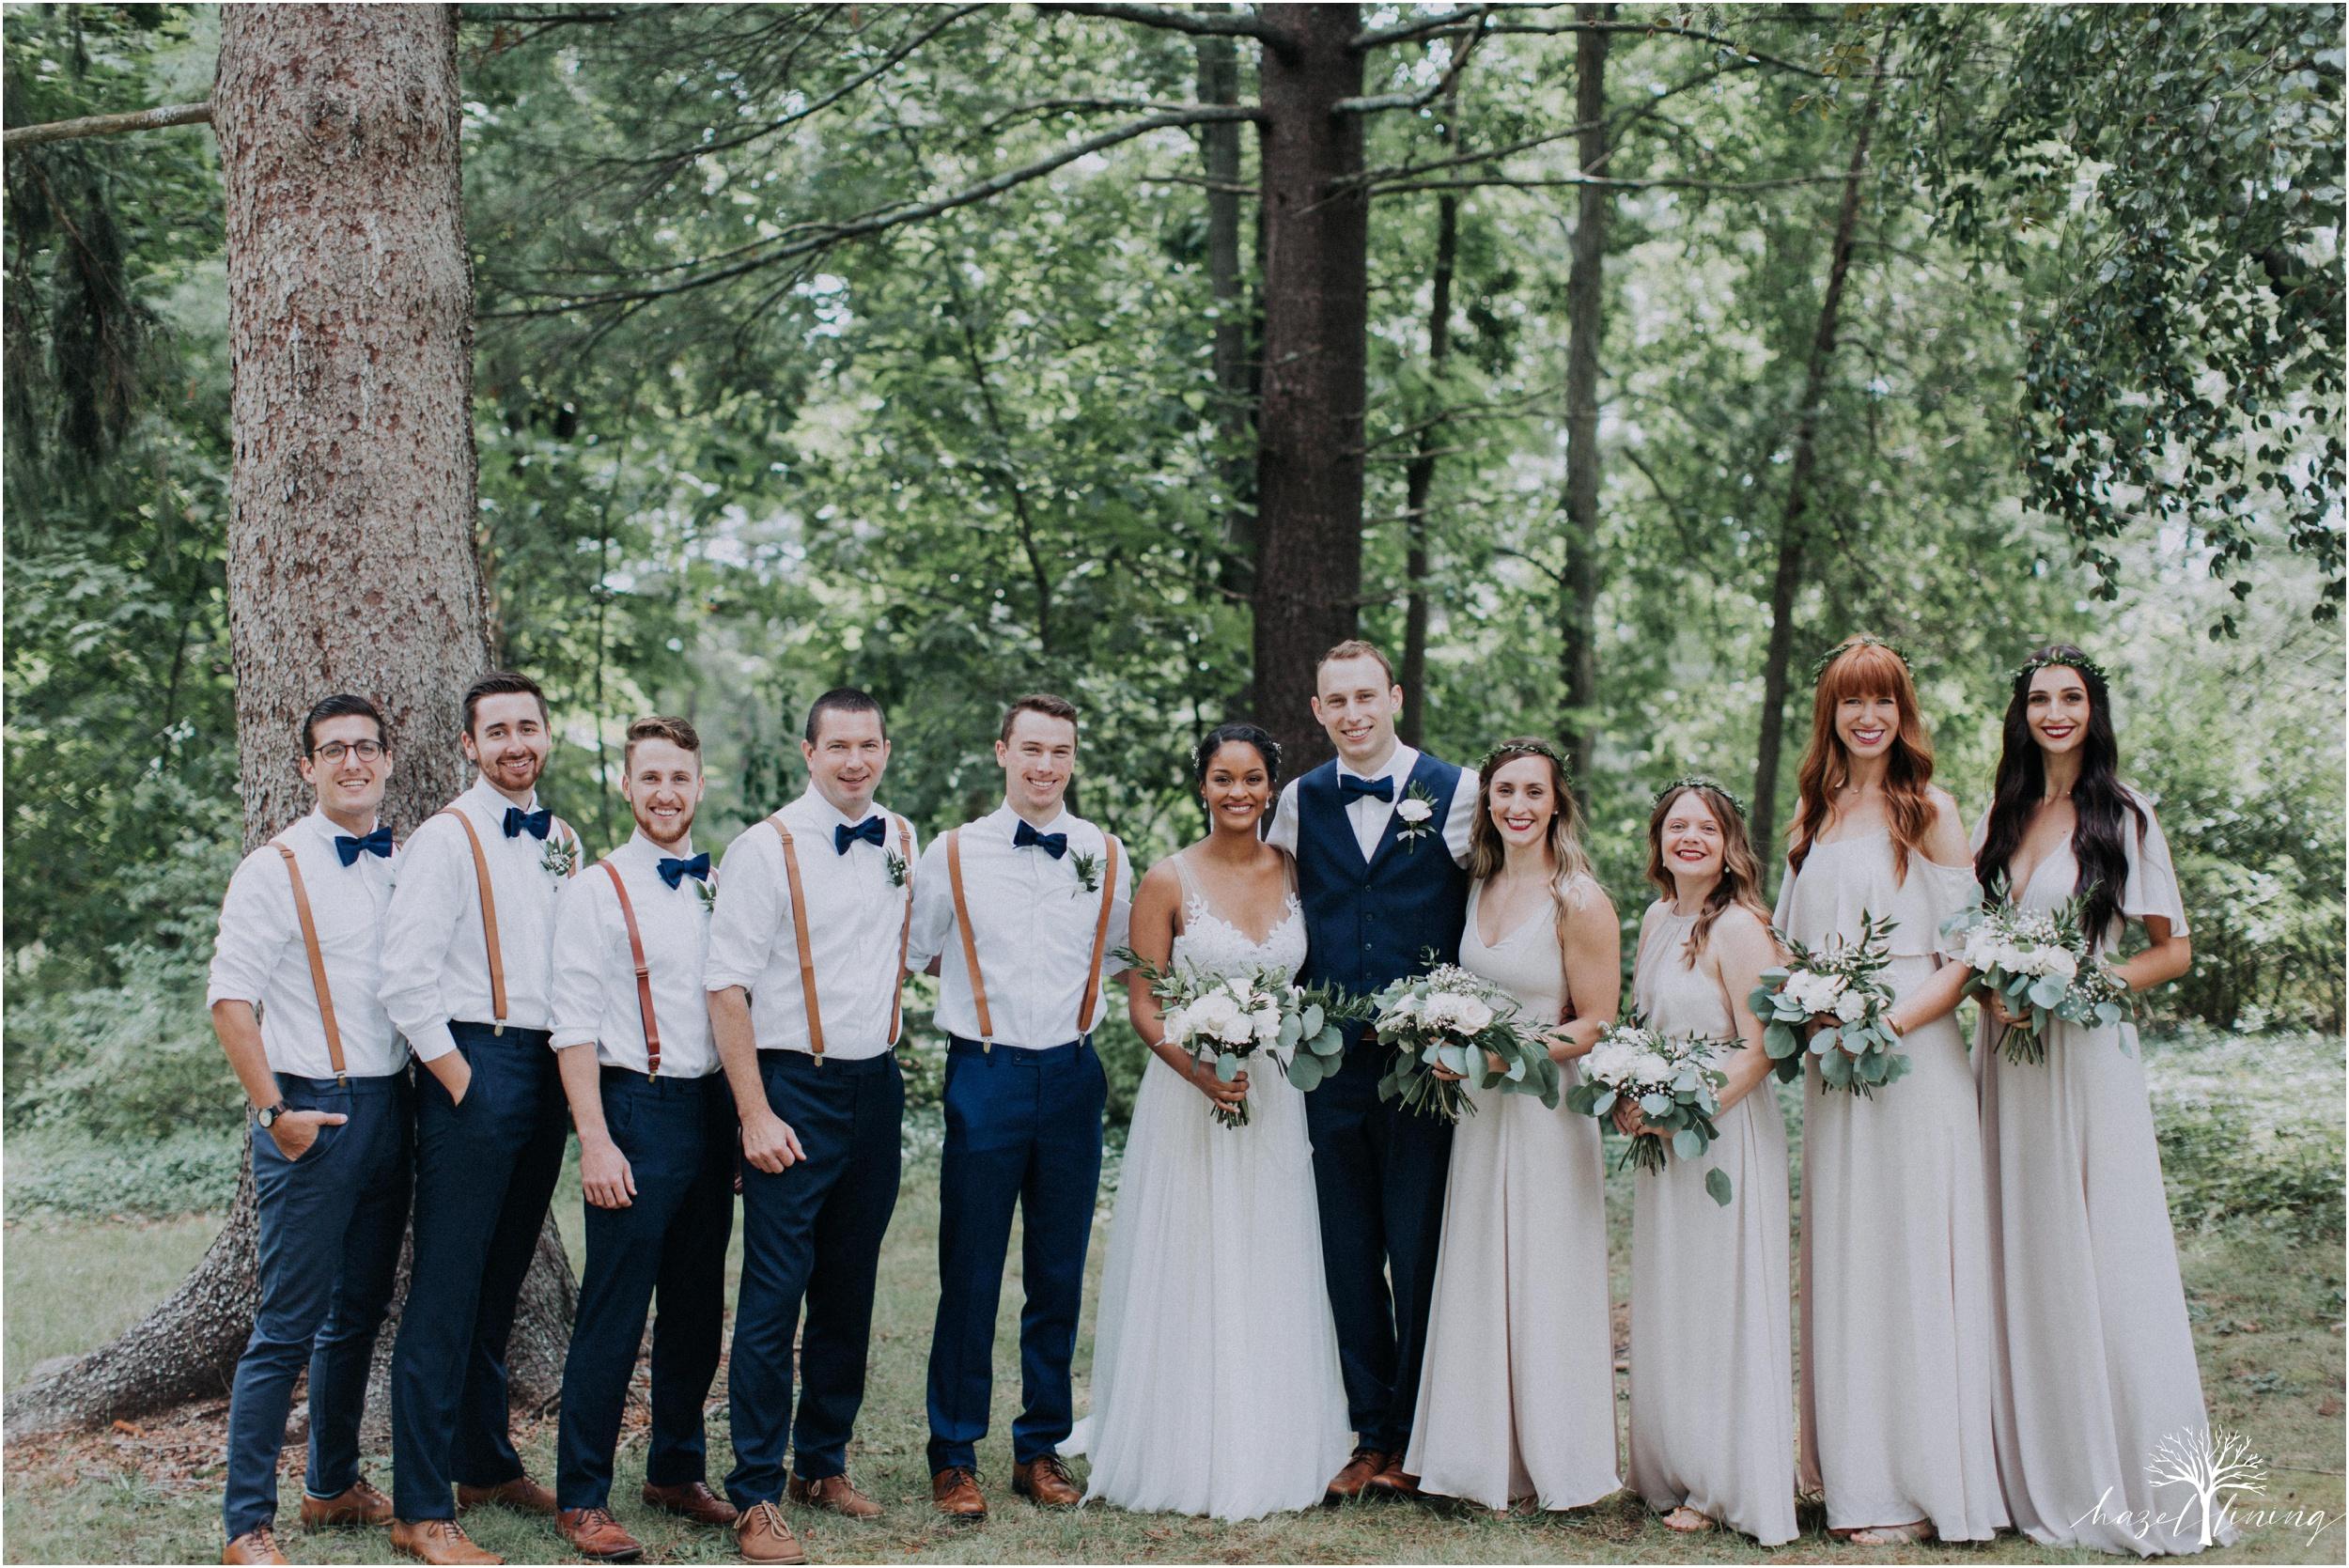 mariah-kreyling-samuel-sherratt-sherrattwiththeworld-peirce-farm-at-witch-hill-boston-massachusetts-wedding-photography-hazel-lining-travel-wedding-elopement-photography_0115.jpg